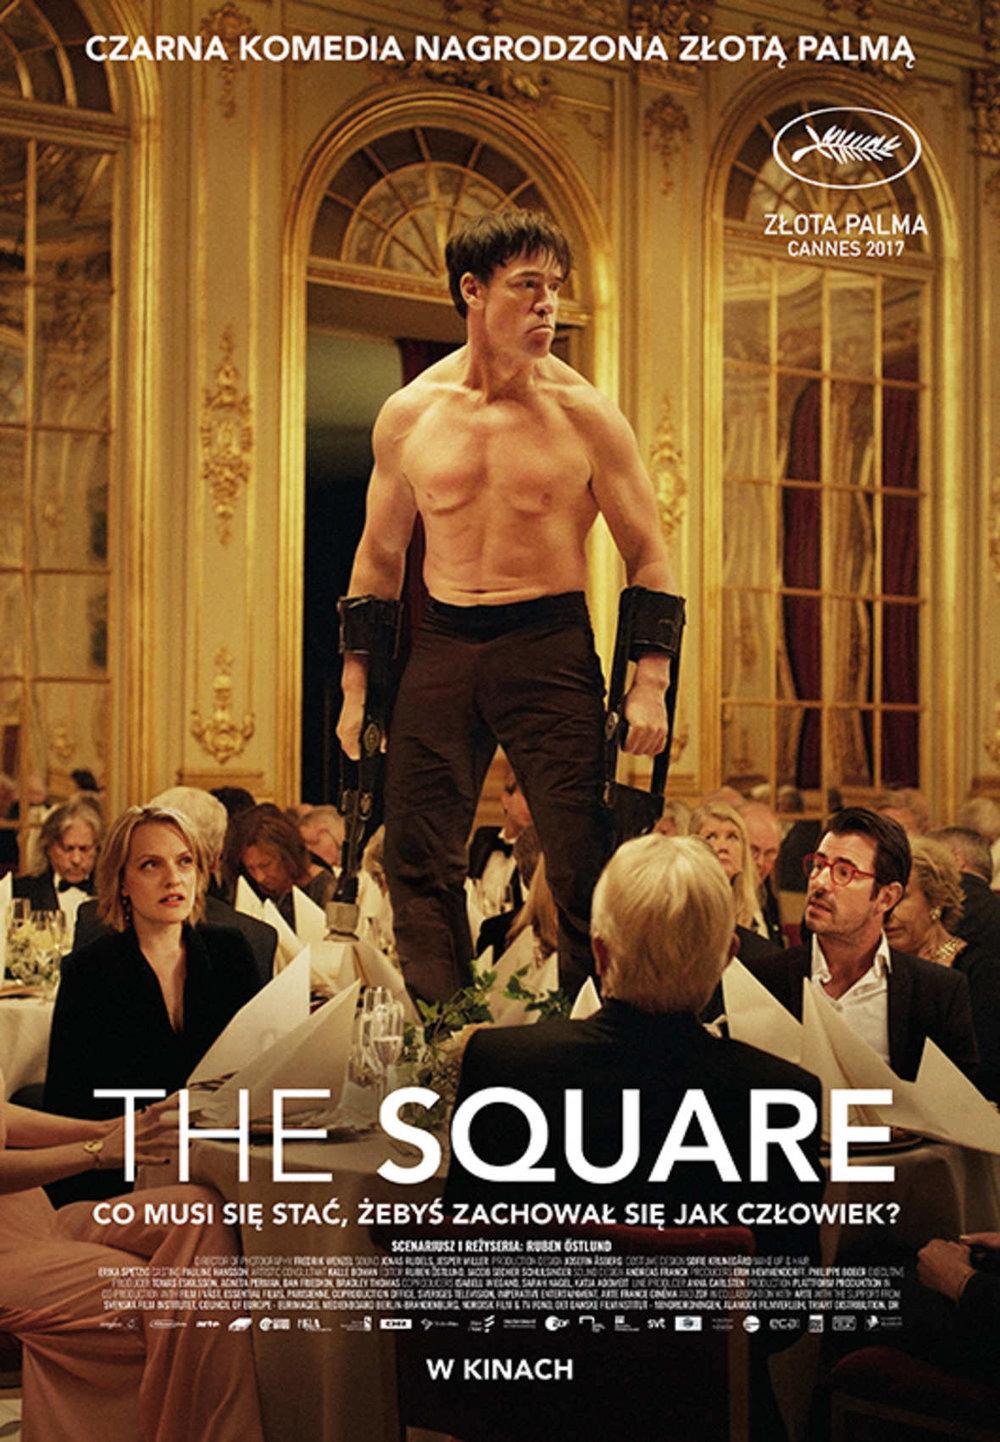 Film-The-Square-w-rezyserii-Rubena-Oestlunda_article.jpg